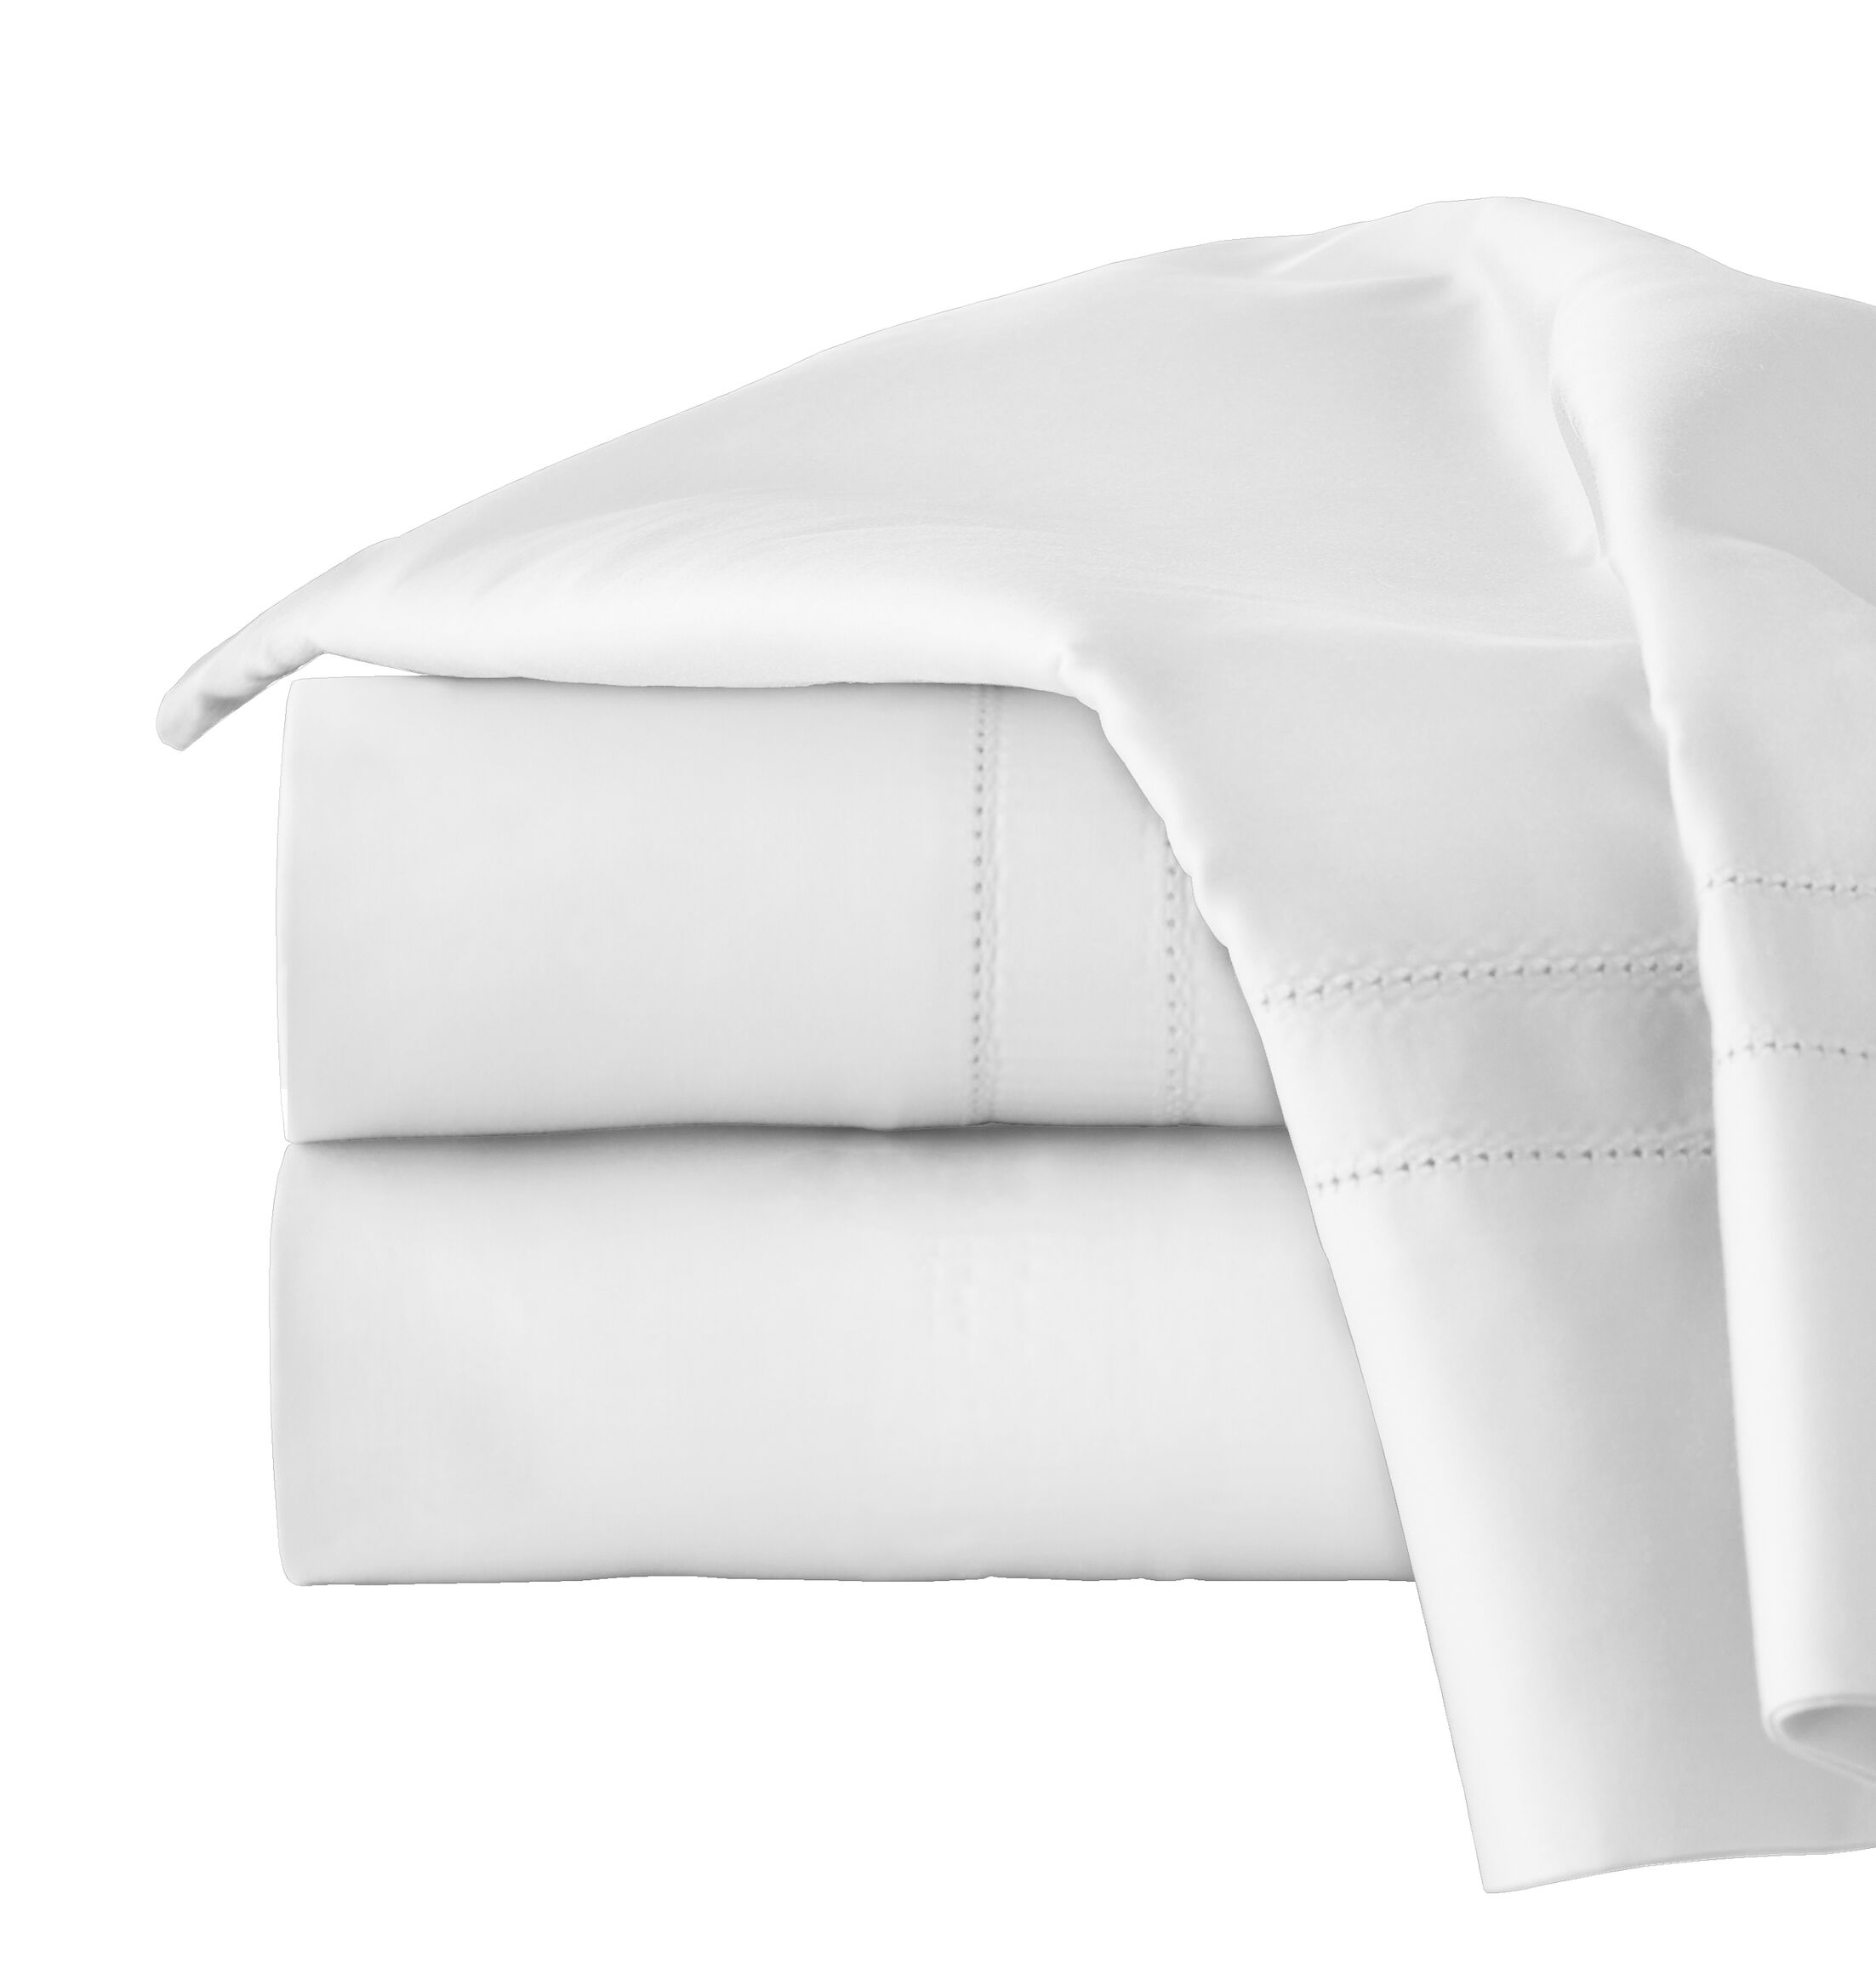 620 Thread Long Staple Count 100% Cotton Sheet Set Color: White, Size: King